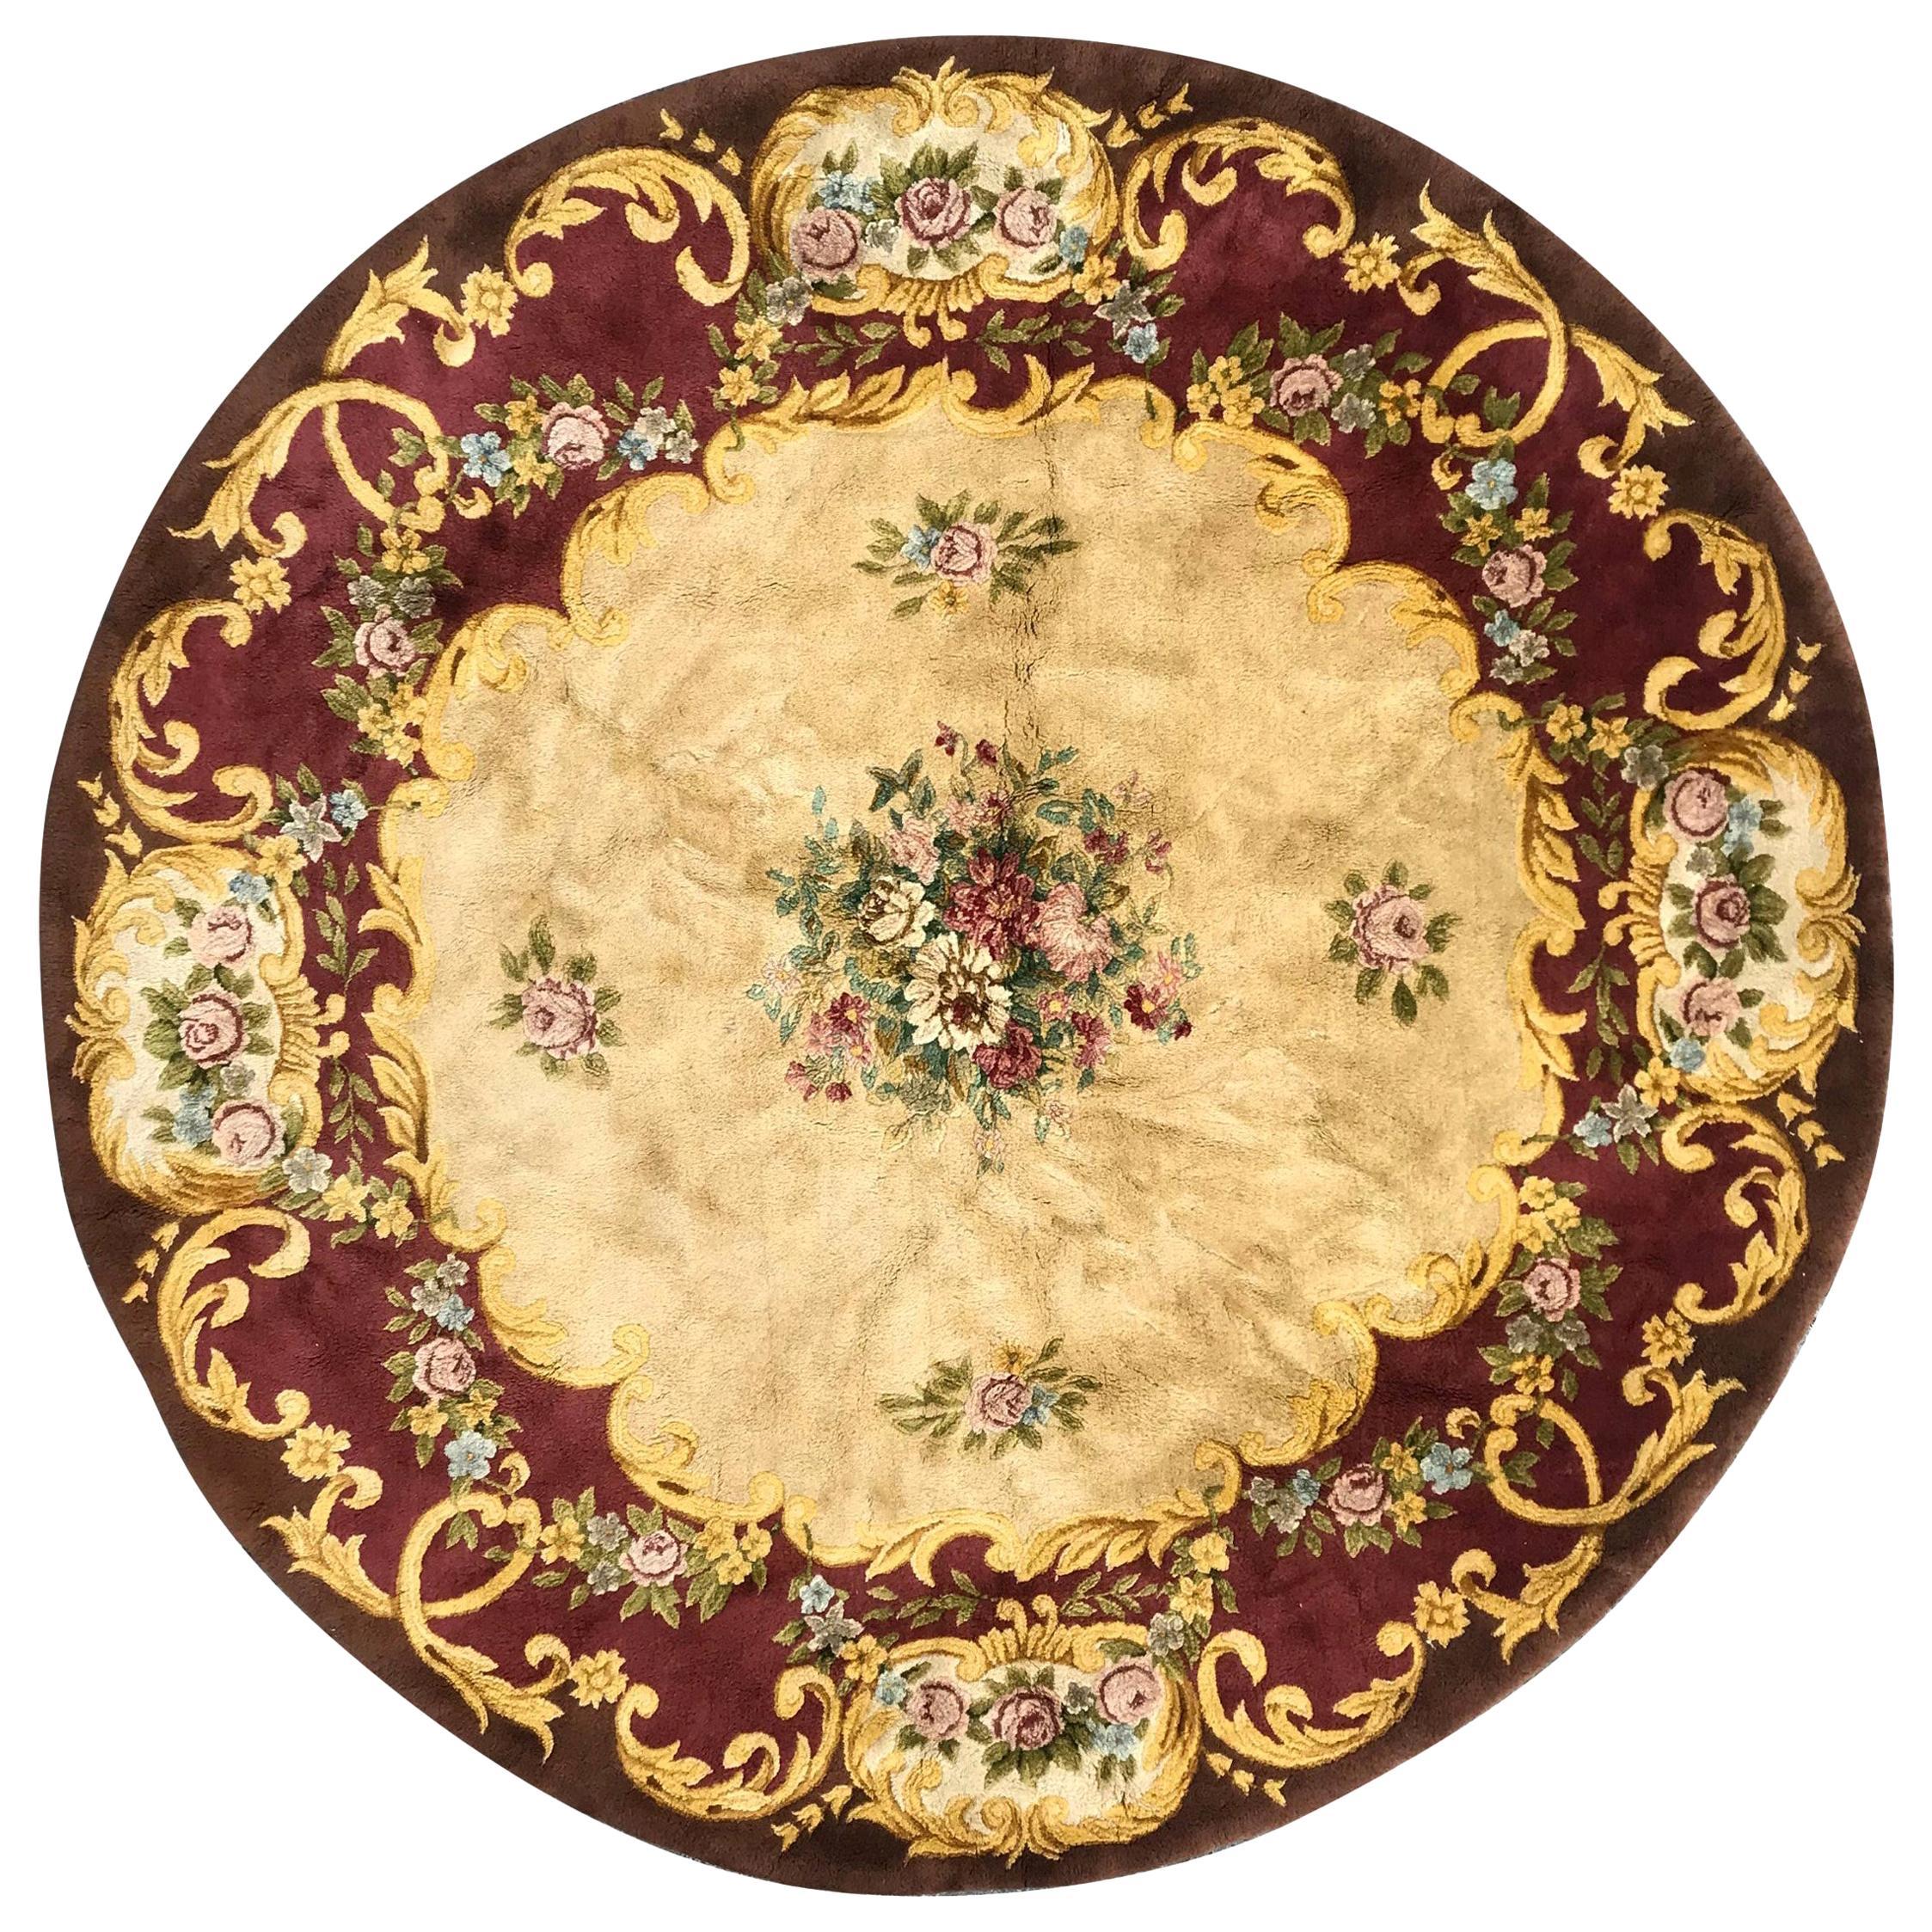 Beautiful Vintage Round Savonnerie Rug